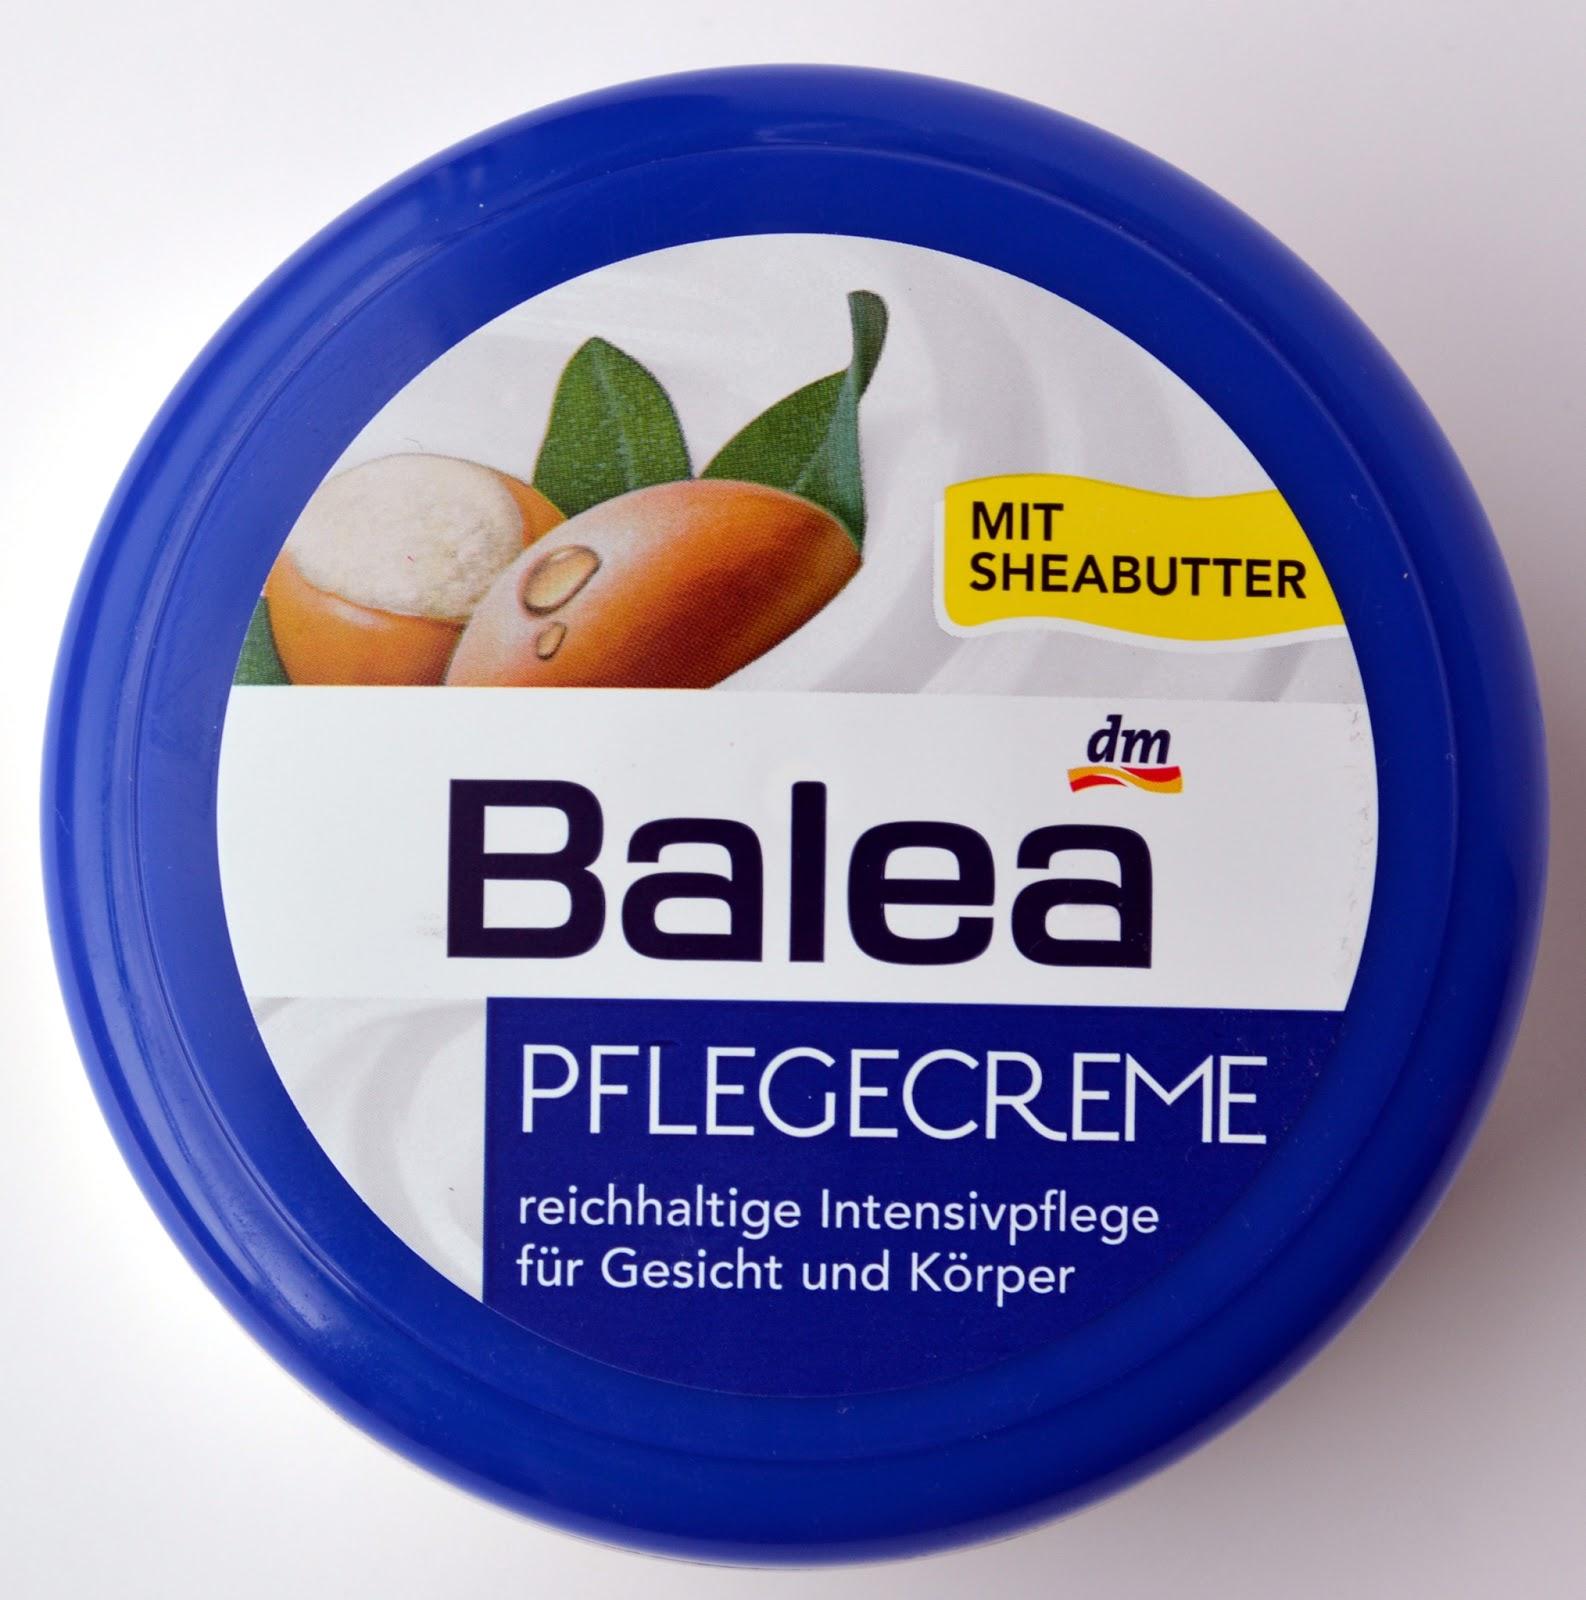 http://lenas-sofa.blogspot.de/2014/03/balea-pflegecreme-mit-sheabutter.html